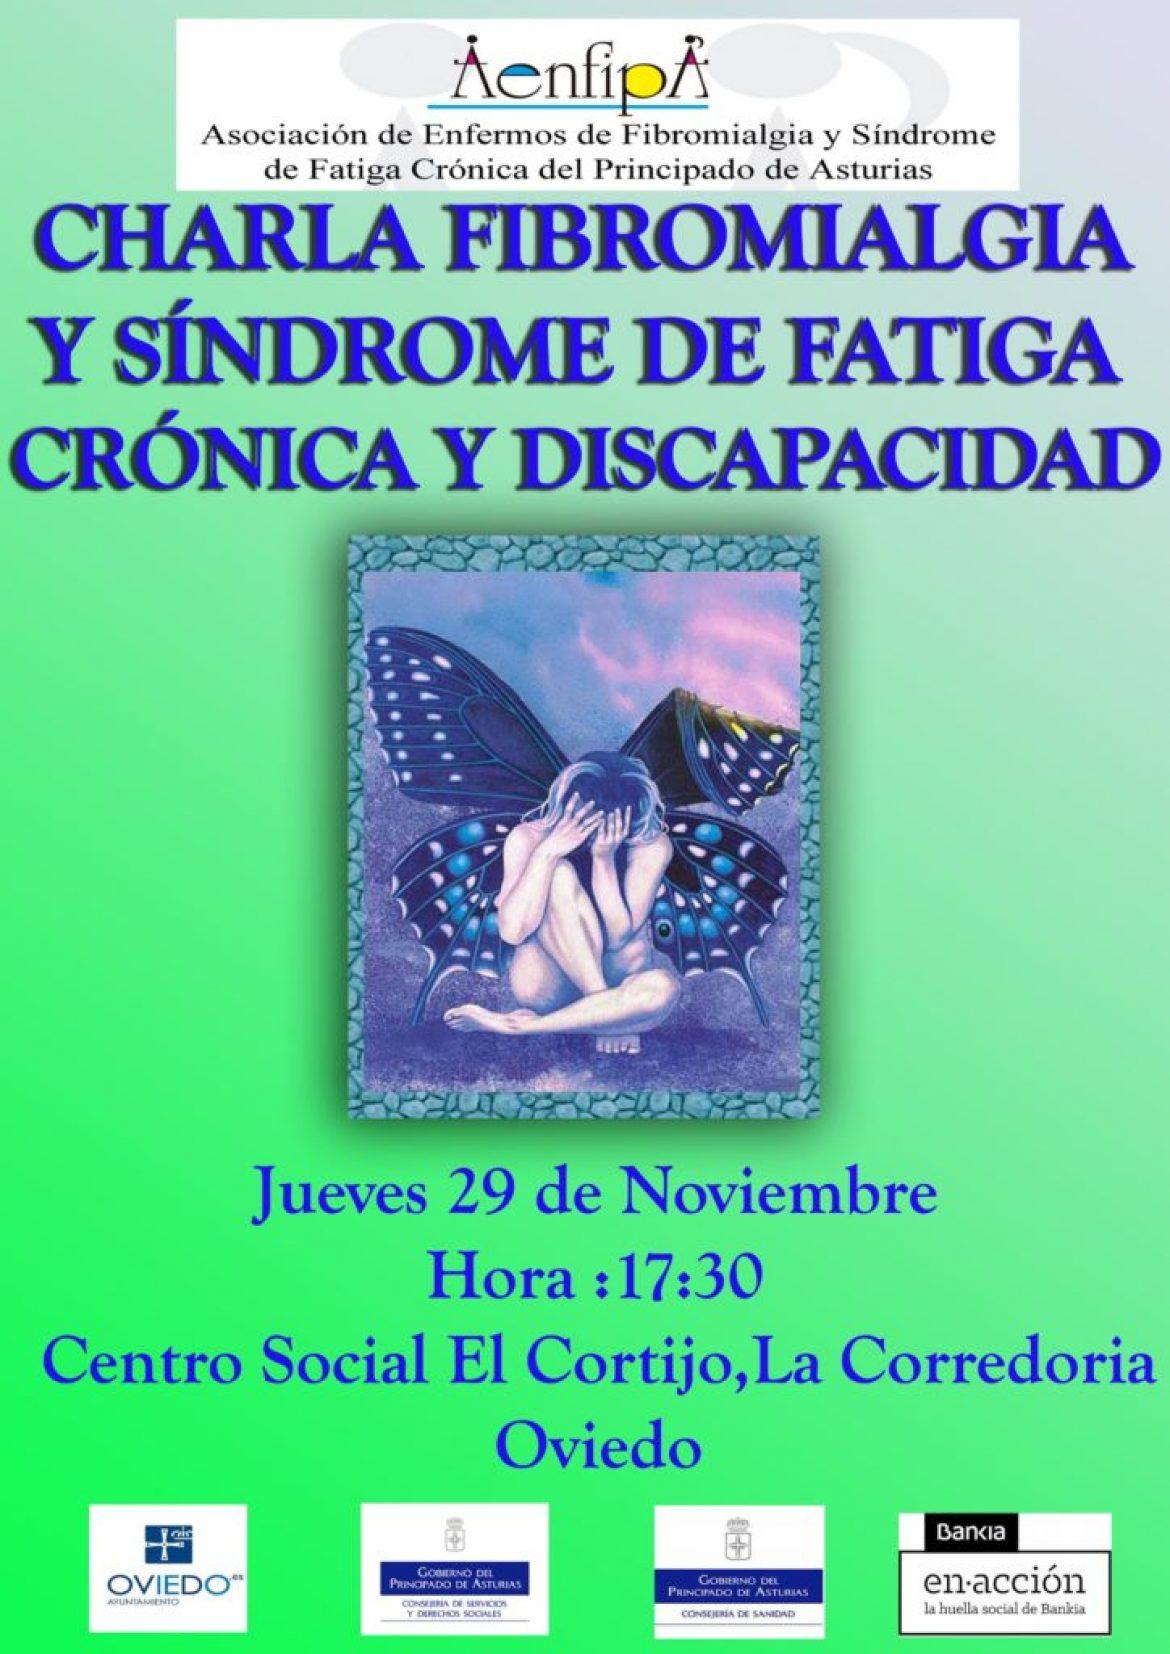 Charla Jueves 29, La Corredoria